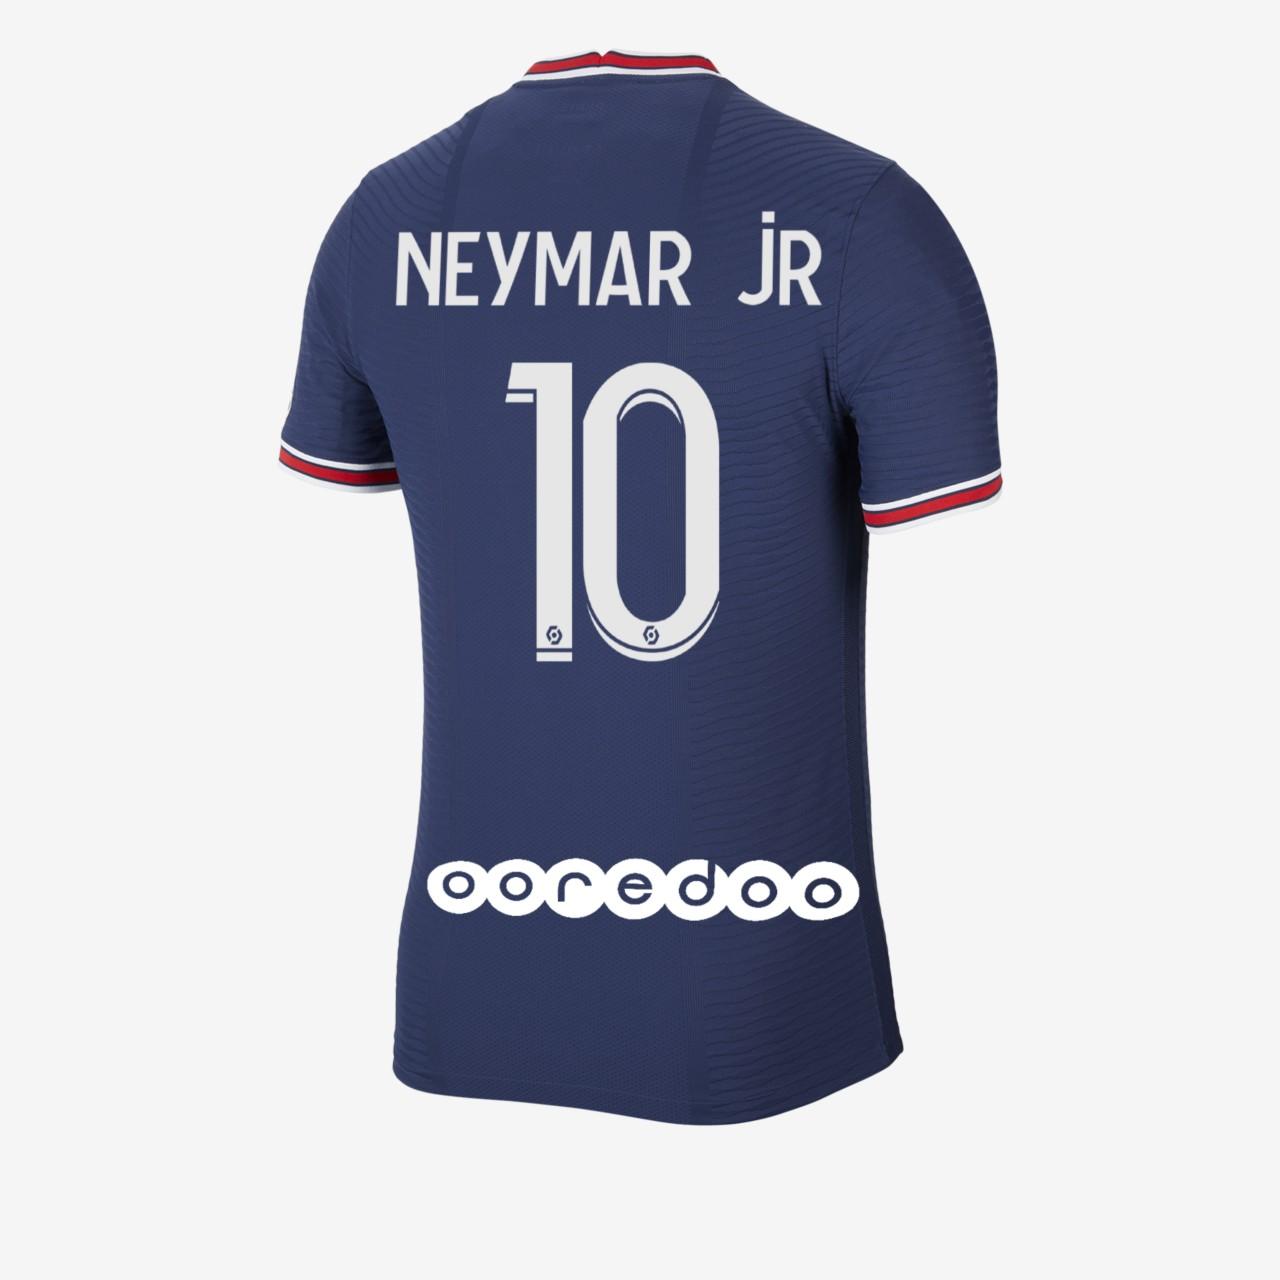 Maillot PSG flocage Neymar